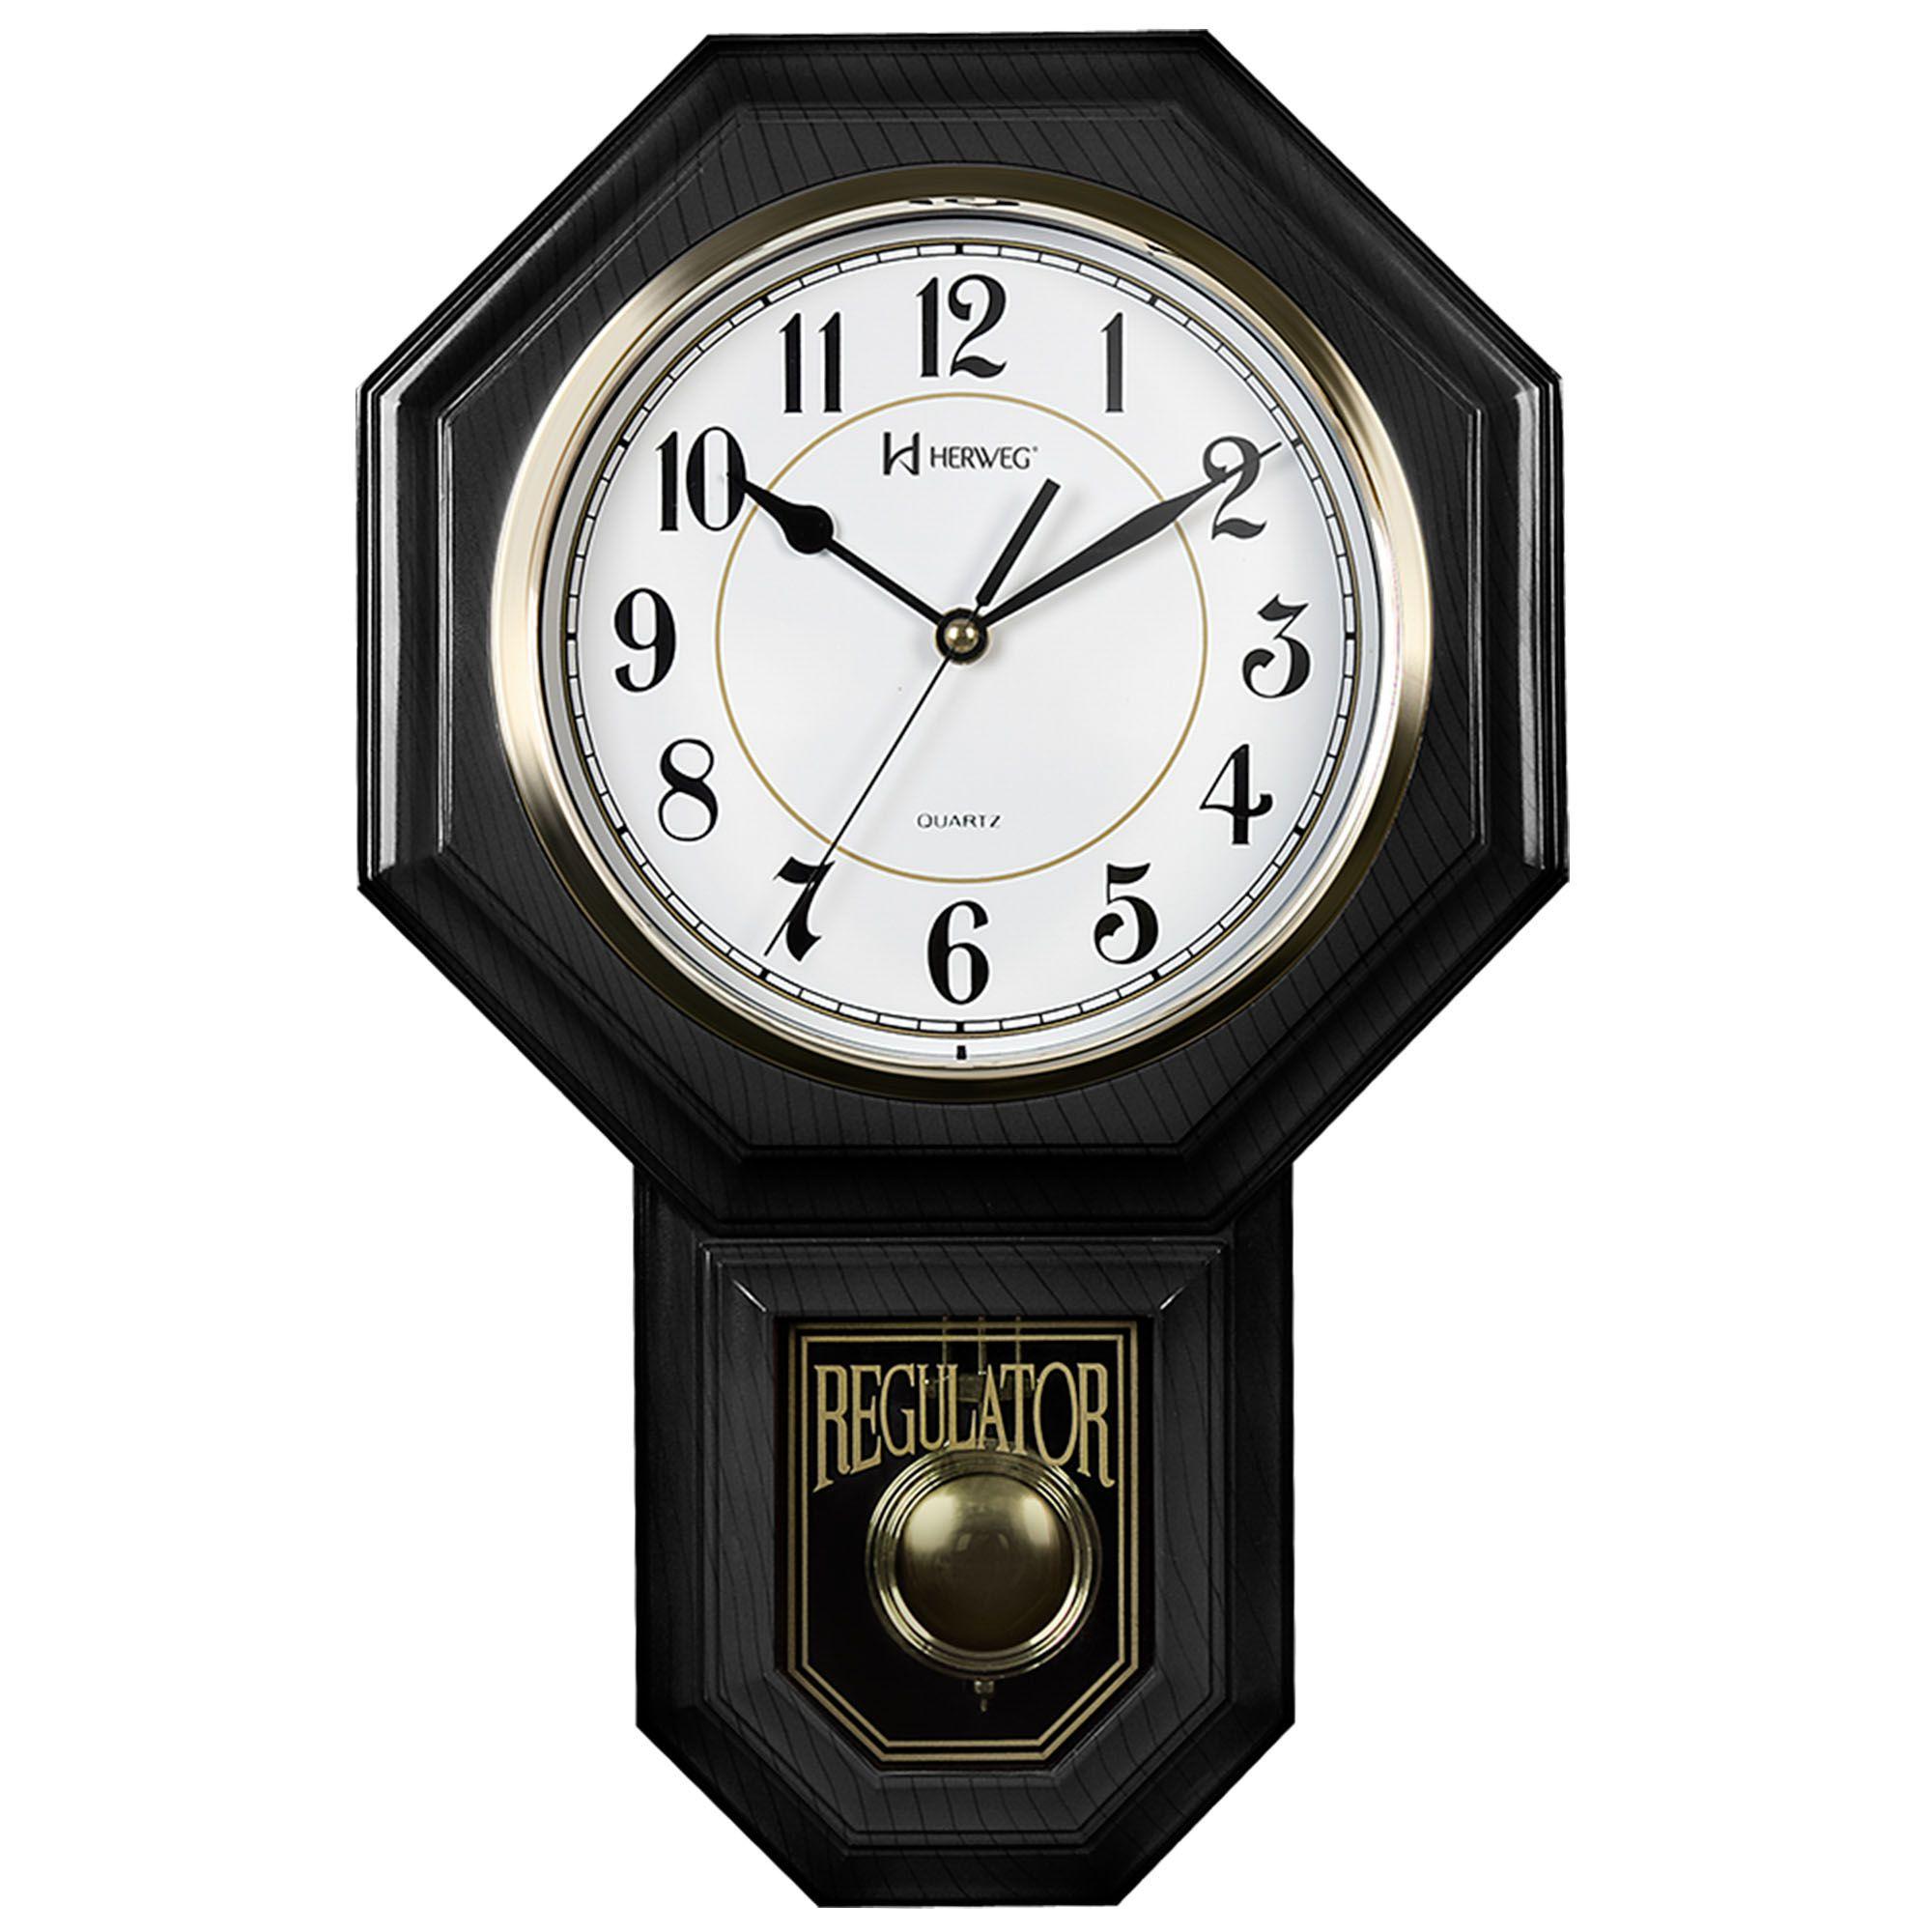 Relógio de Parede Pêndulo Herweg 5304 034 Preto